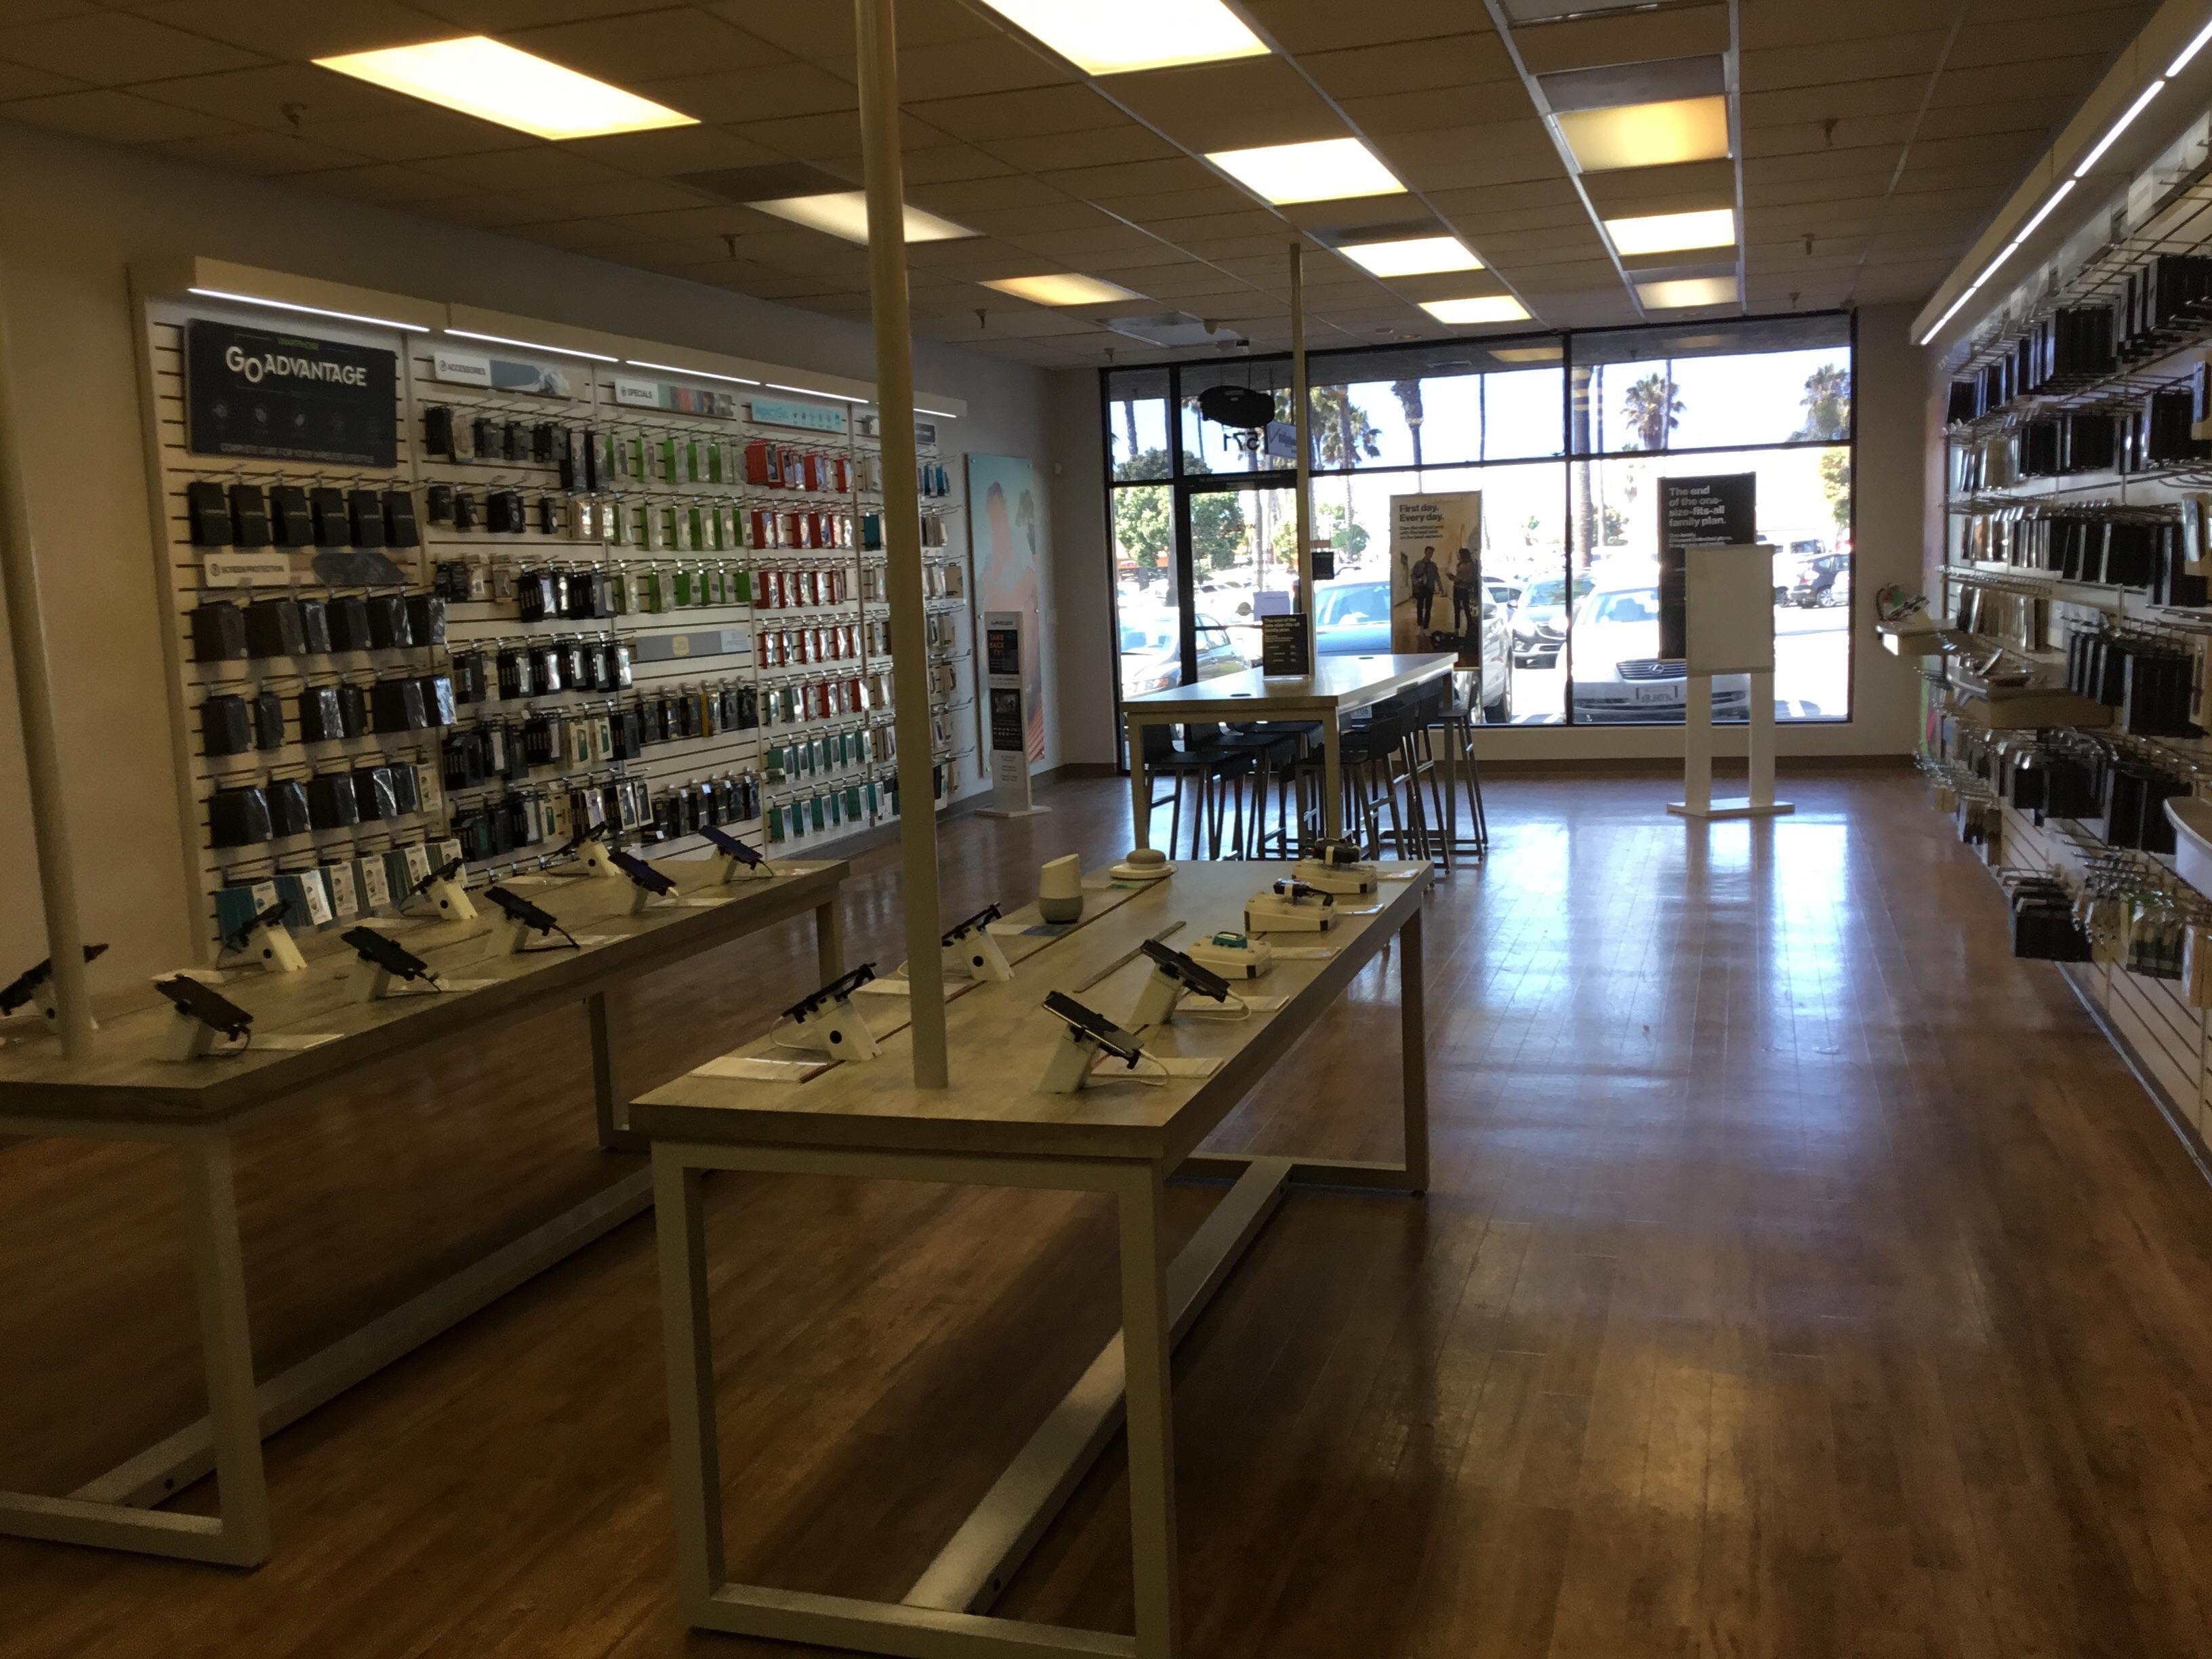 Verizon Authorized Retailer – GoWireless - CLOSED image 7